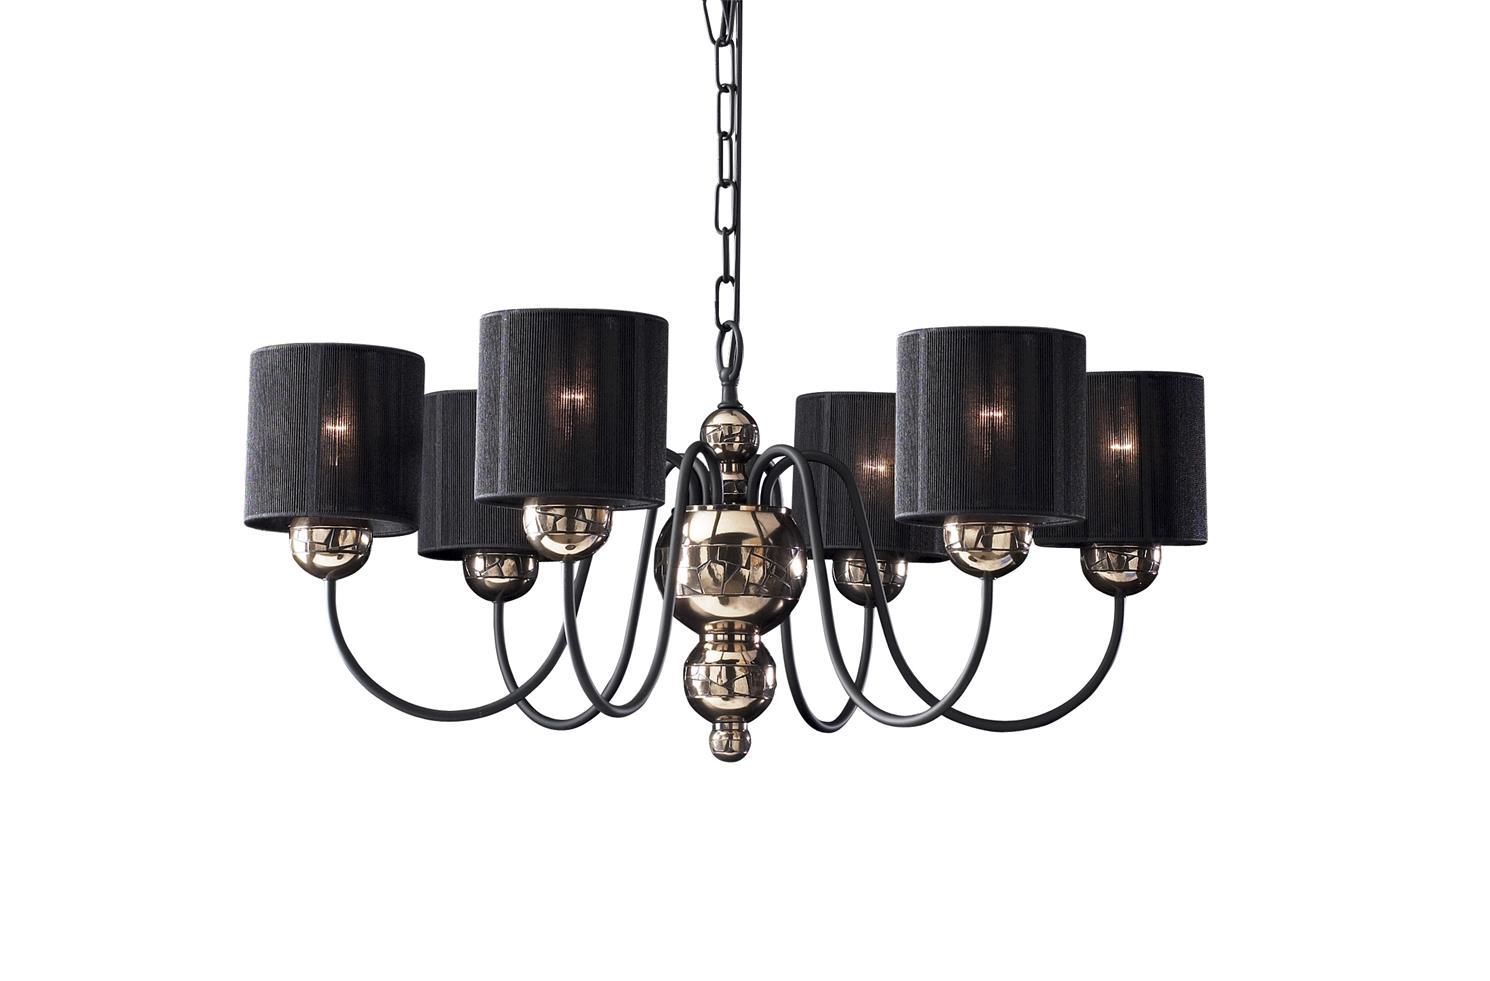 David Hunt Lighting GAR0663 Garbo 6 Light Pendant in Bronze Complete with Black String Shades